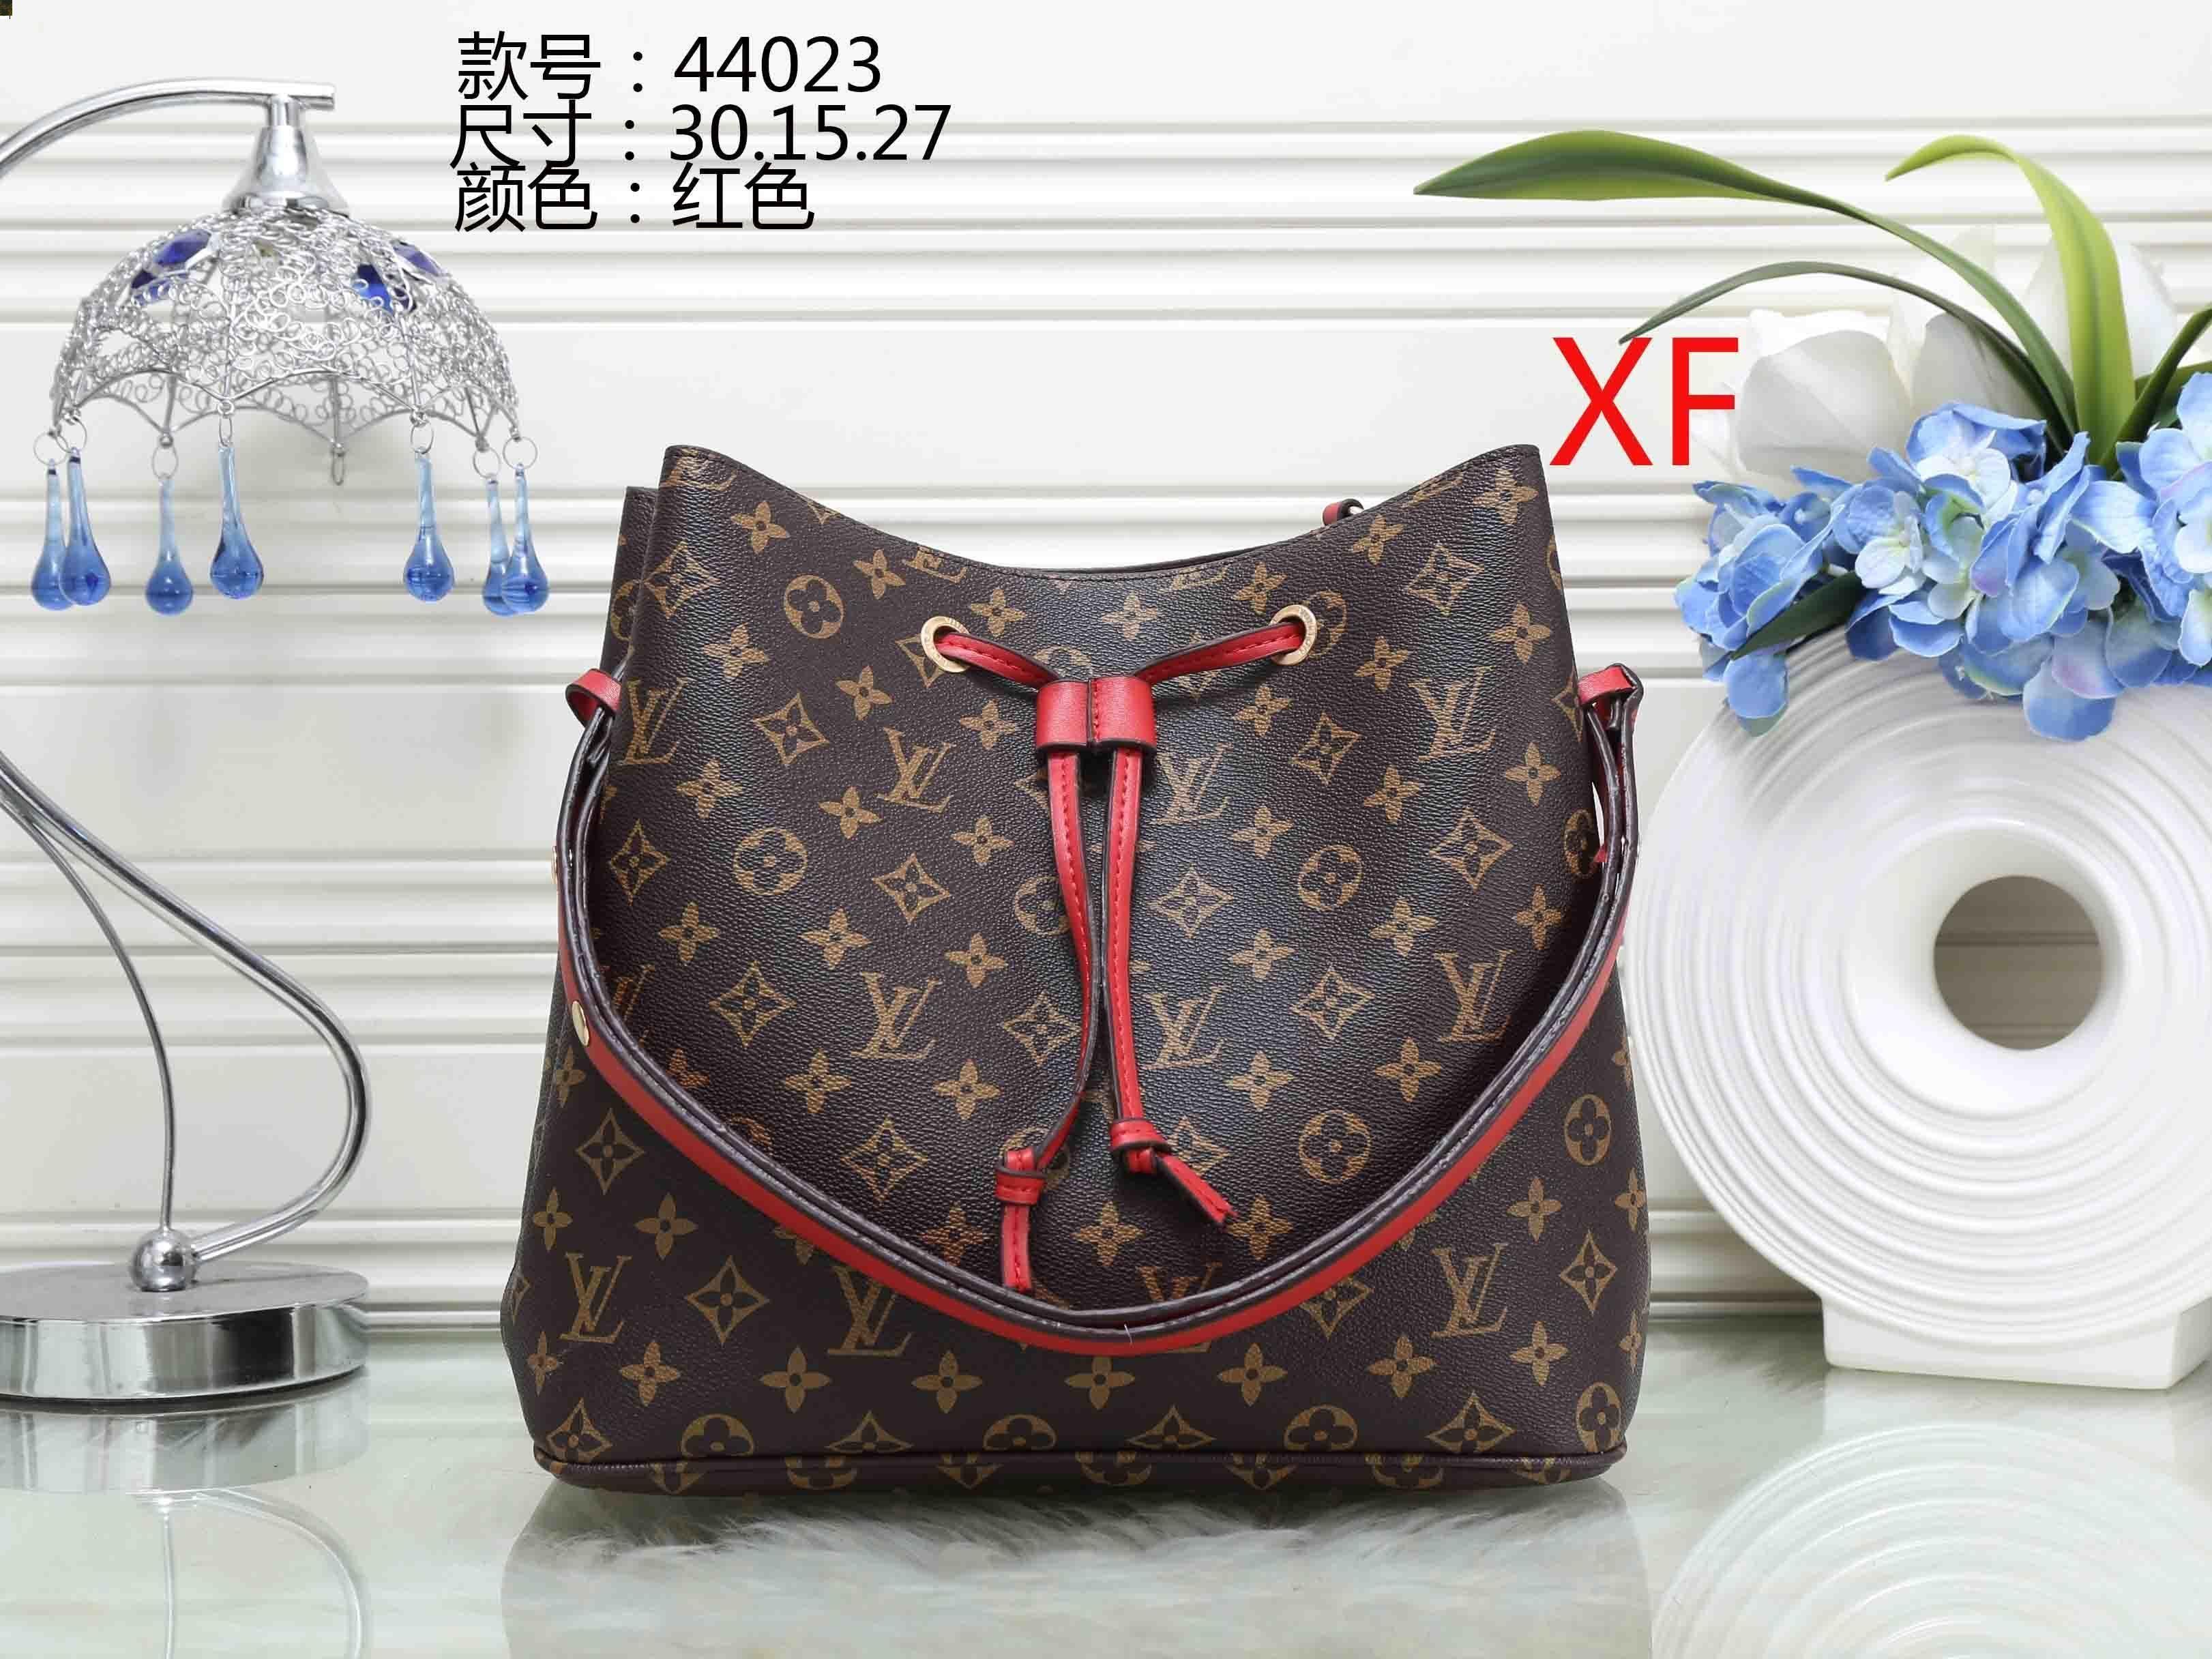 качество бренд сумка дизайнеры сумки luxurys сумочка женская мода цепи печати сумка кошелек телефон сумка бесплатная доставка BLZW 7UJQ LC5L